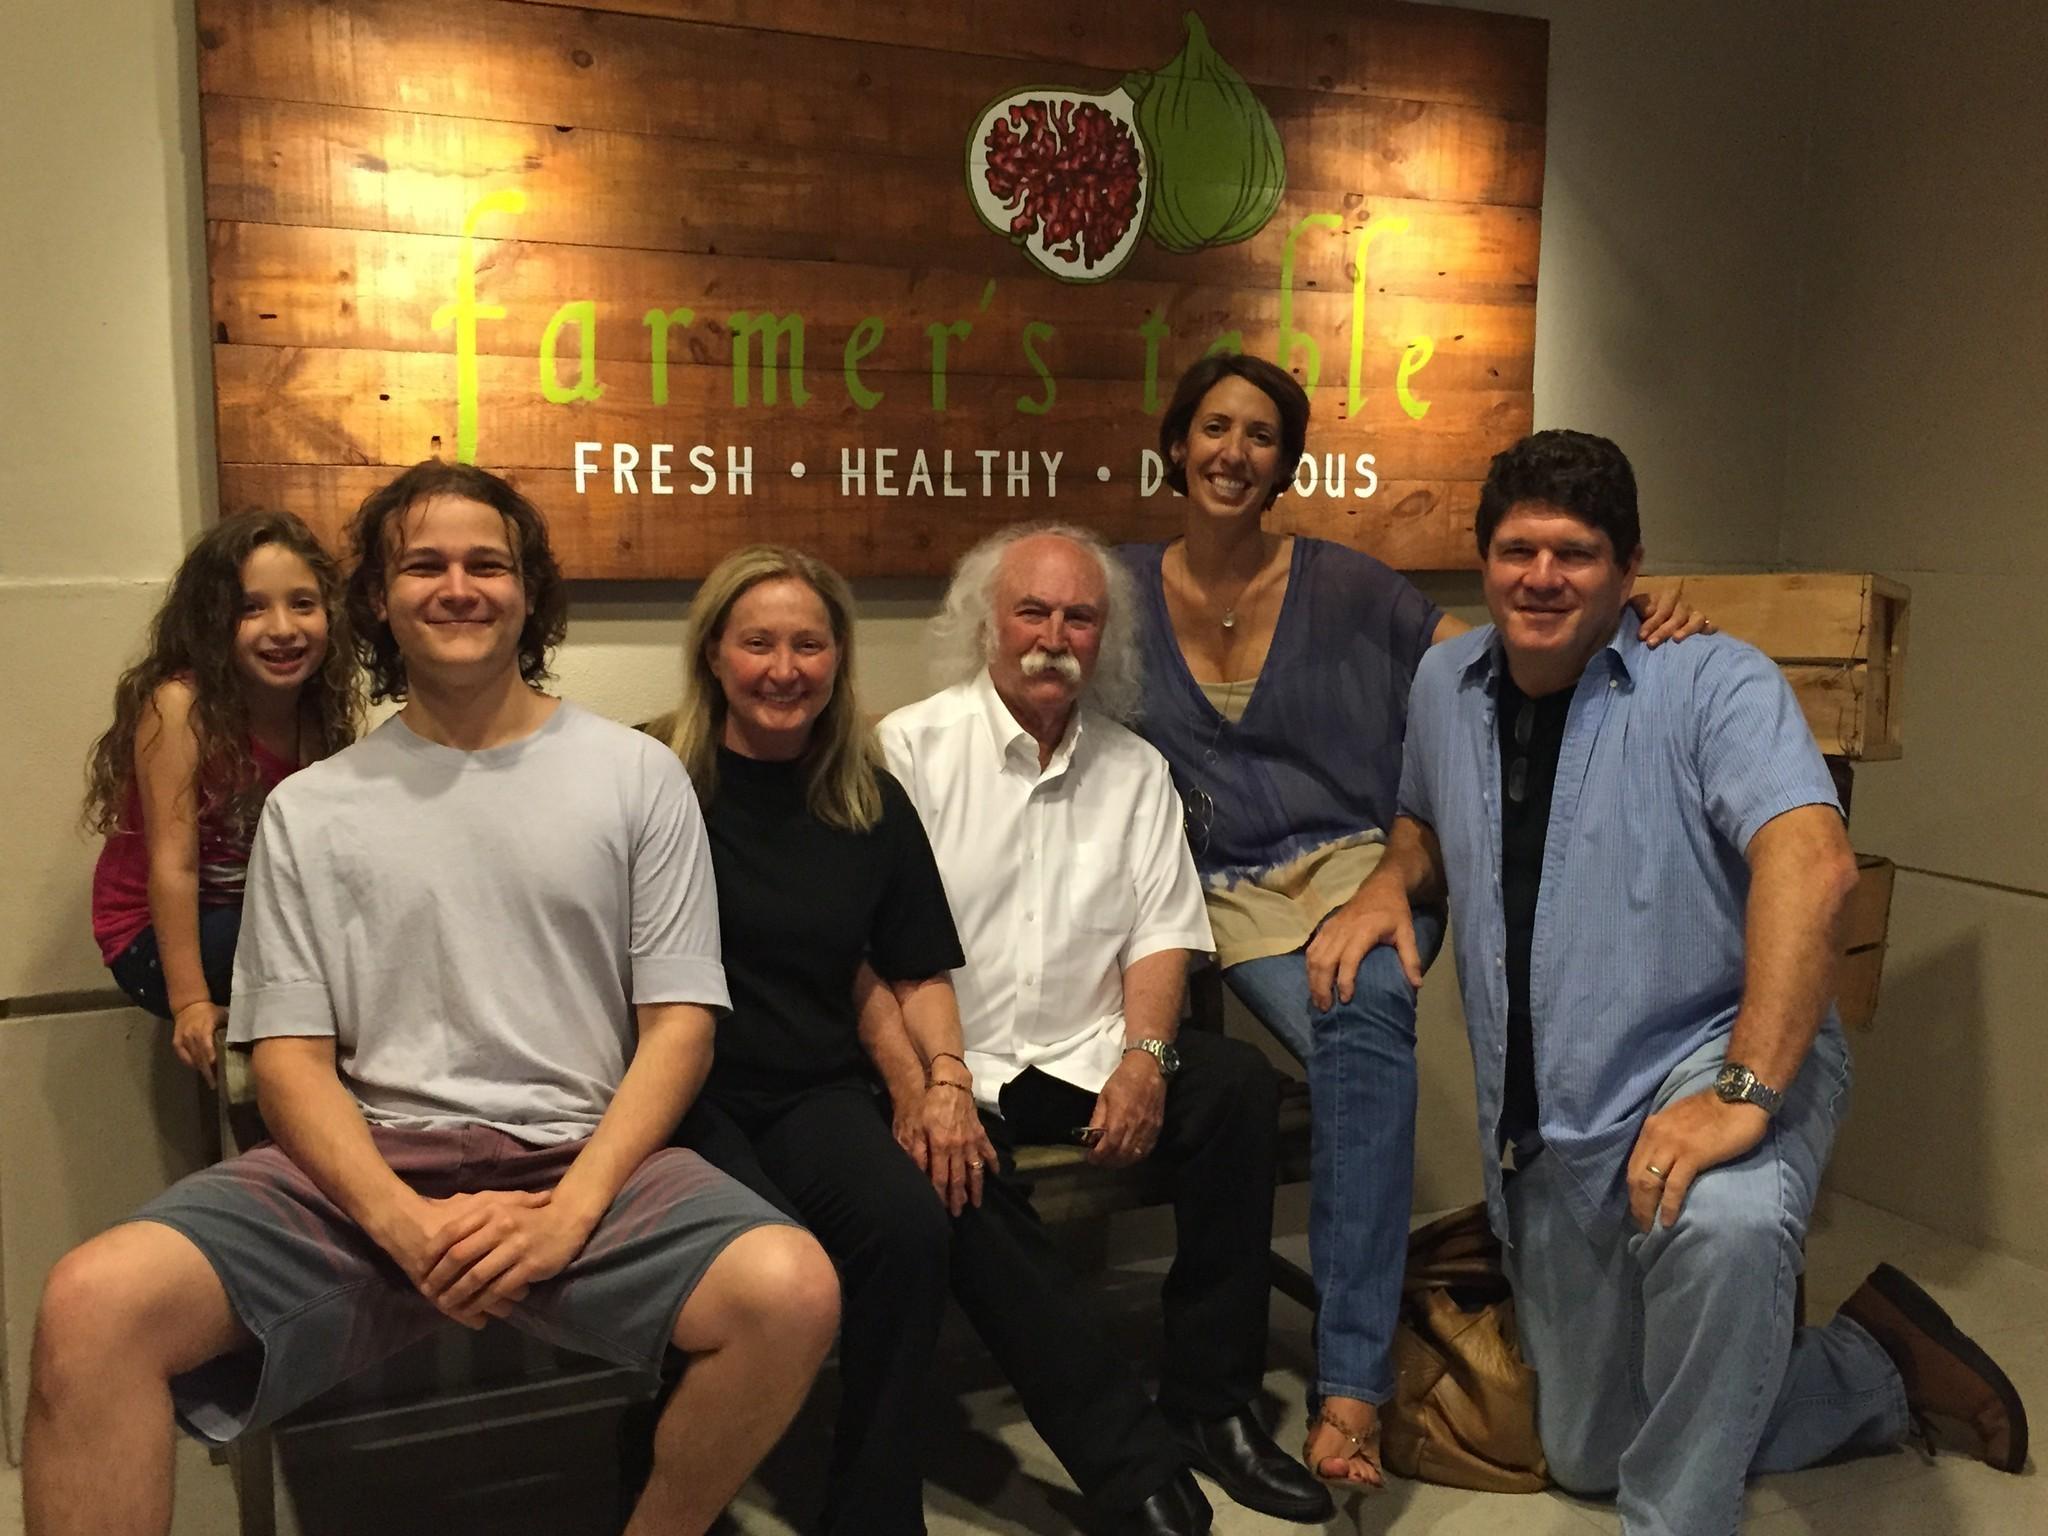 David Crosby dines at Farmer s Table southflorida